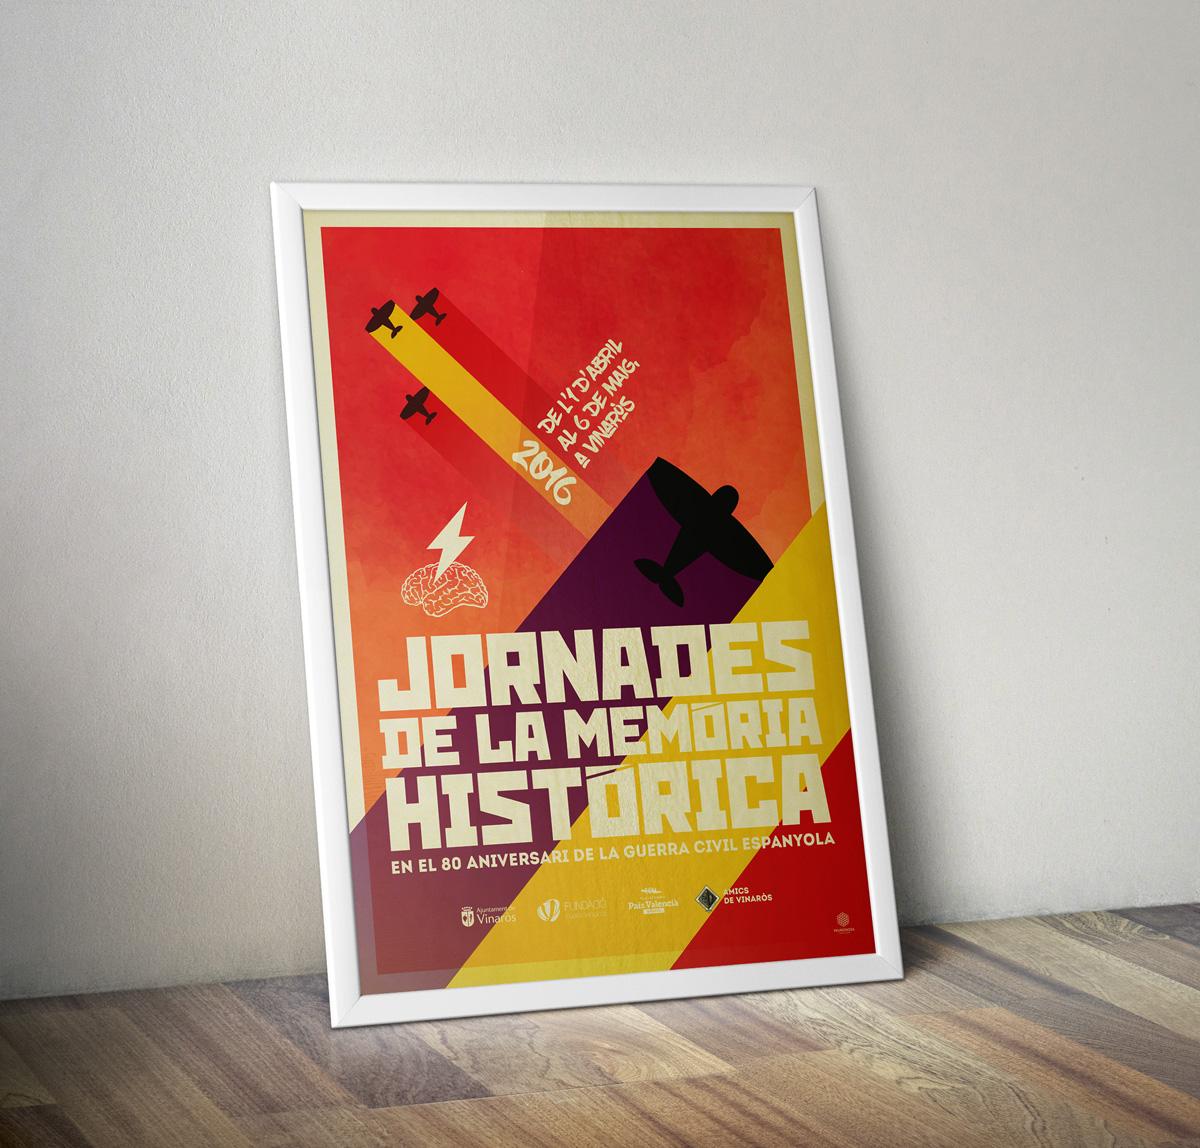 jonades-memoria-historica-vinaros